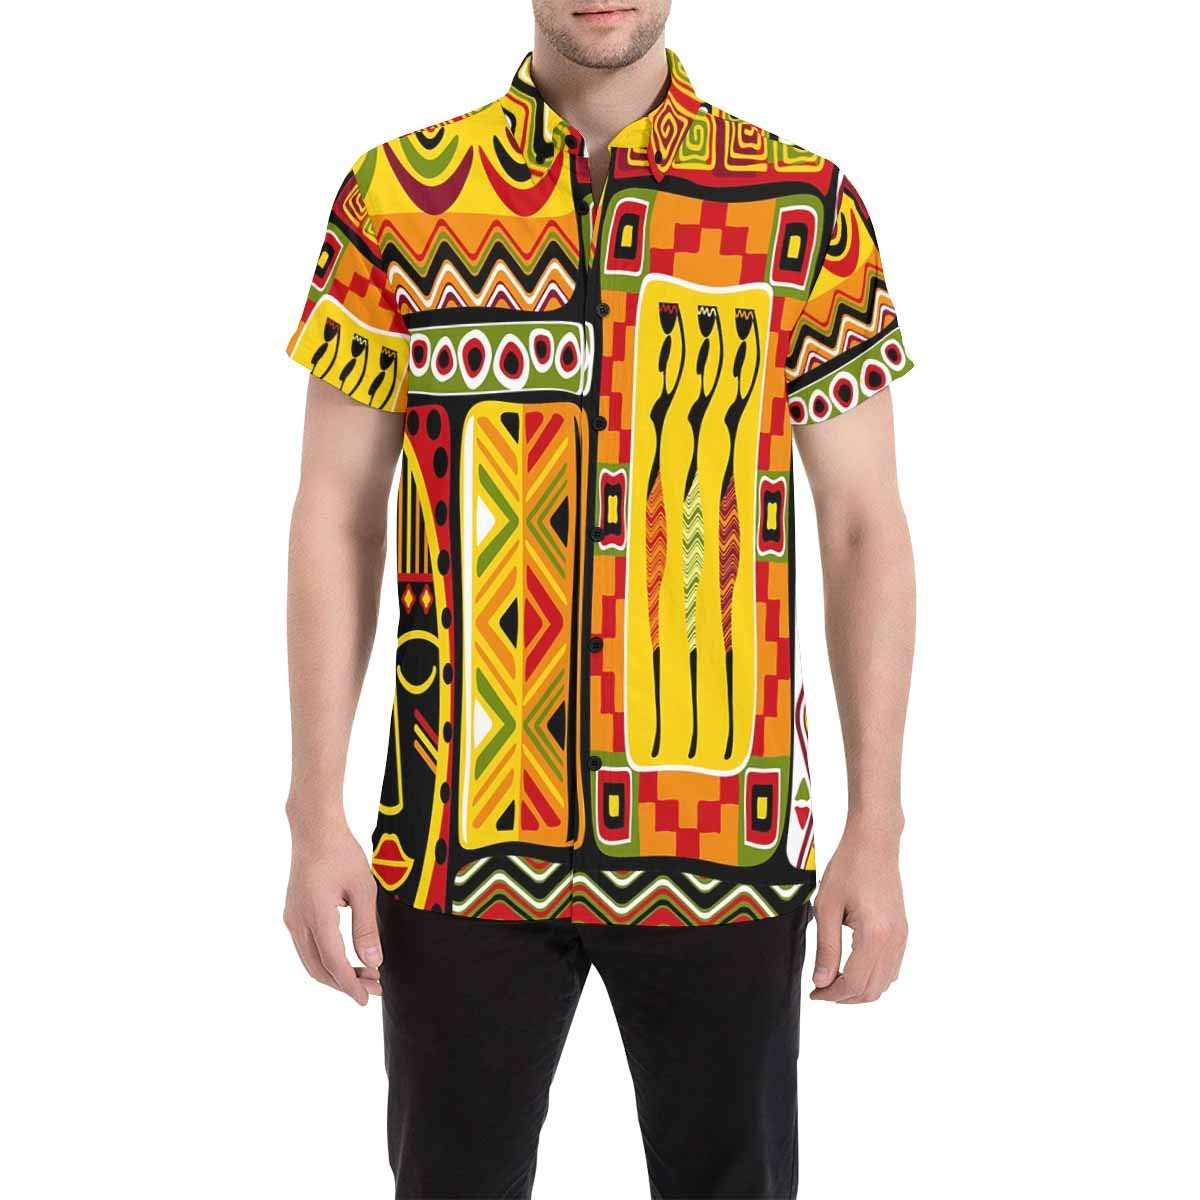 InterestPrint Mens Botton Up Shirt Stylized Acrylic Painting T Shirts for Regular Fit S-5XL